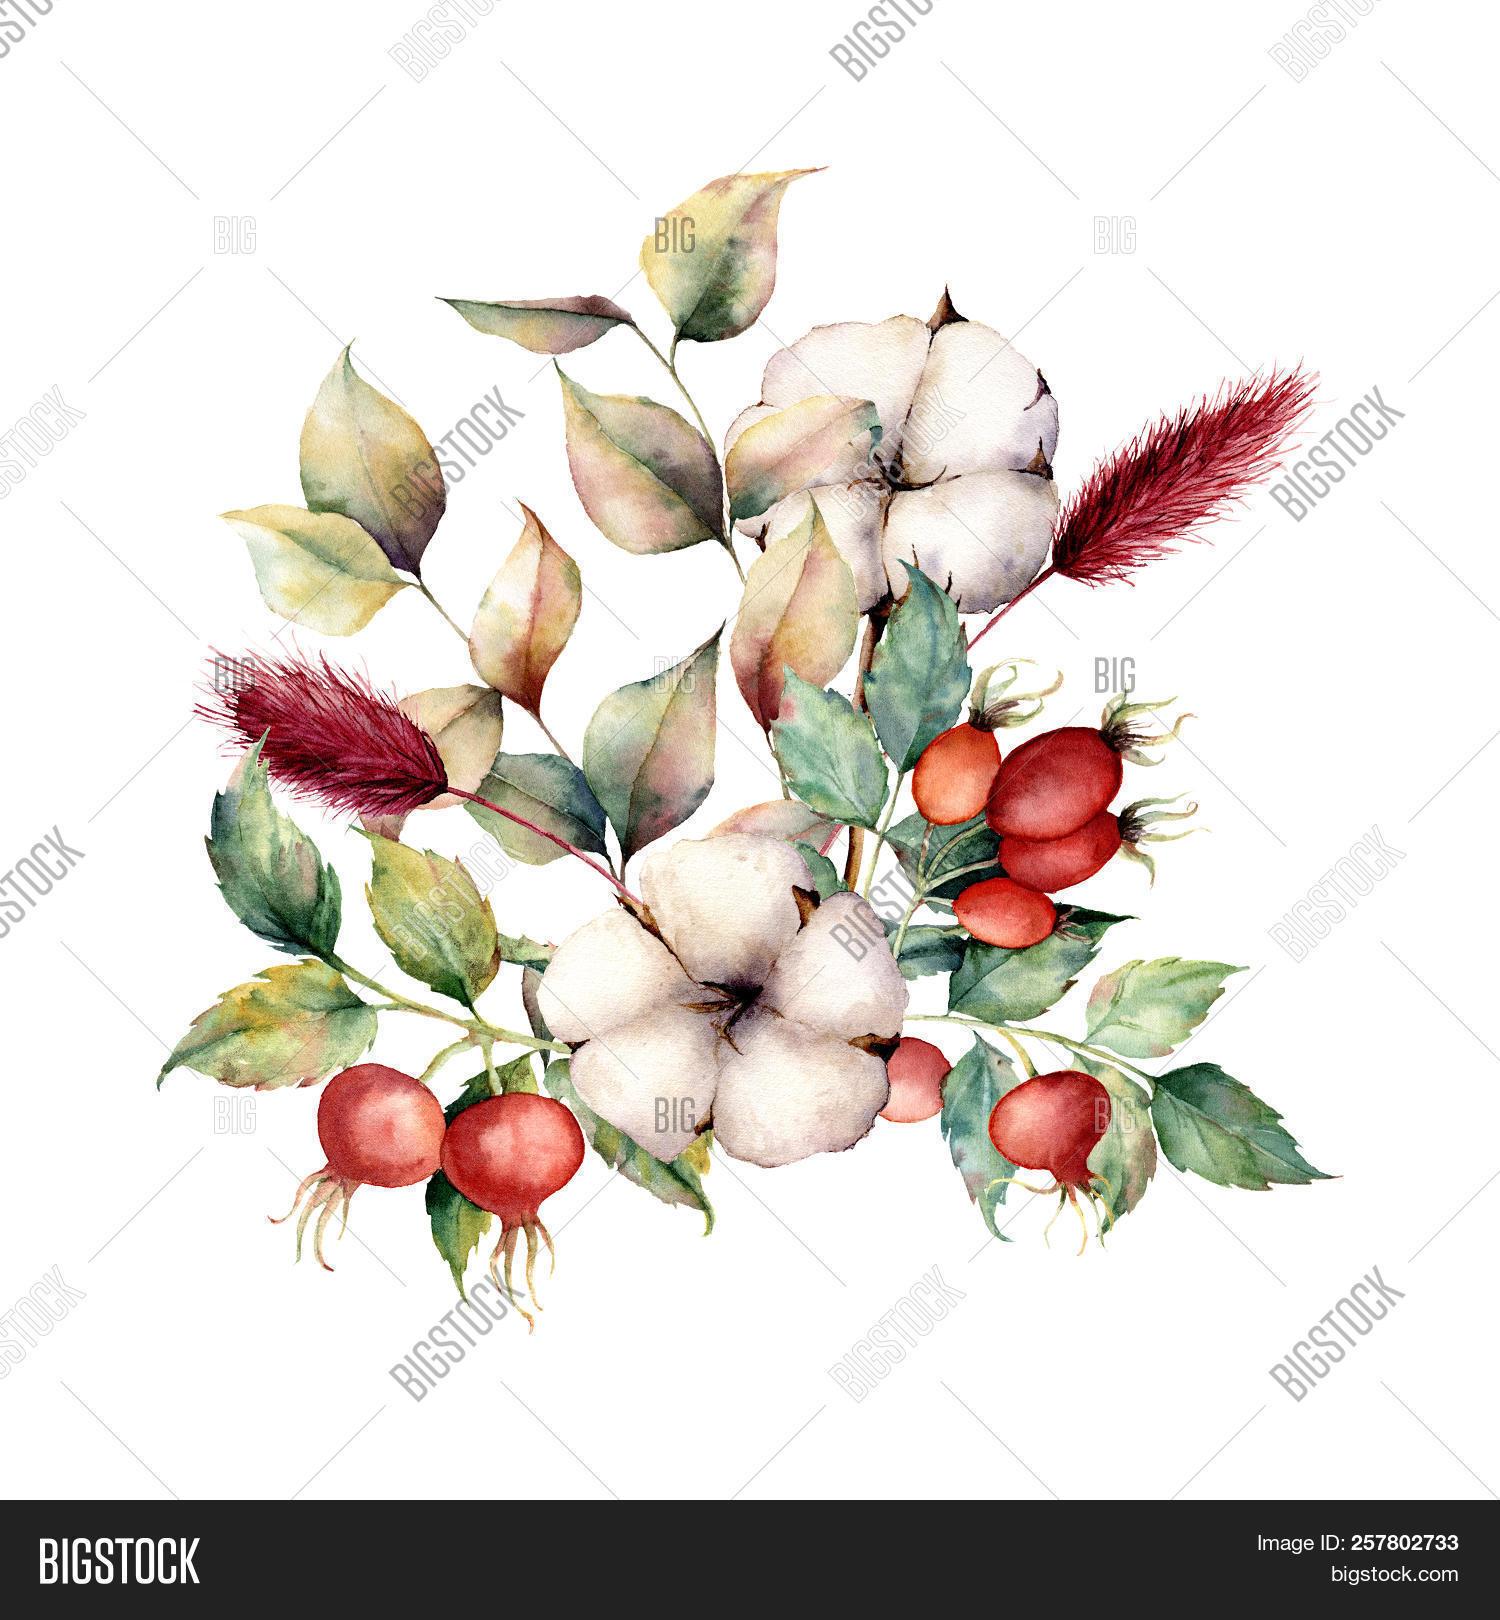 Watercolor Autumn Image Photo Free Trial Bigstock